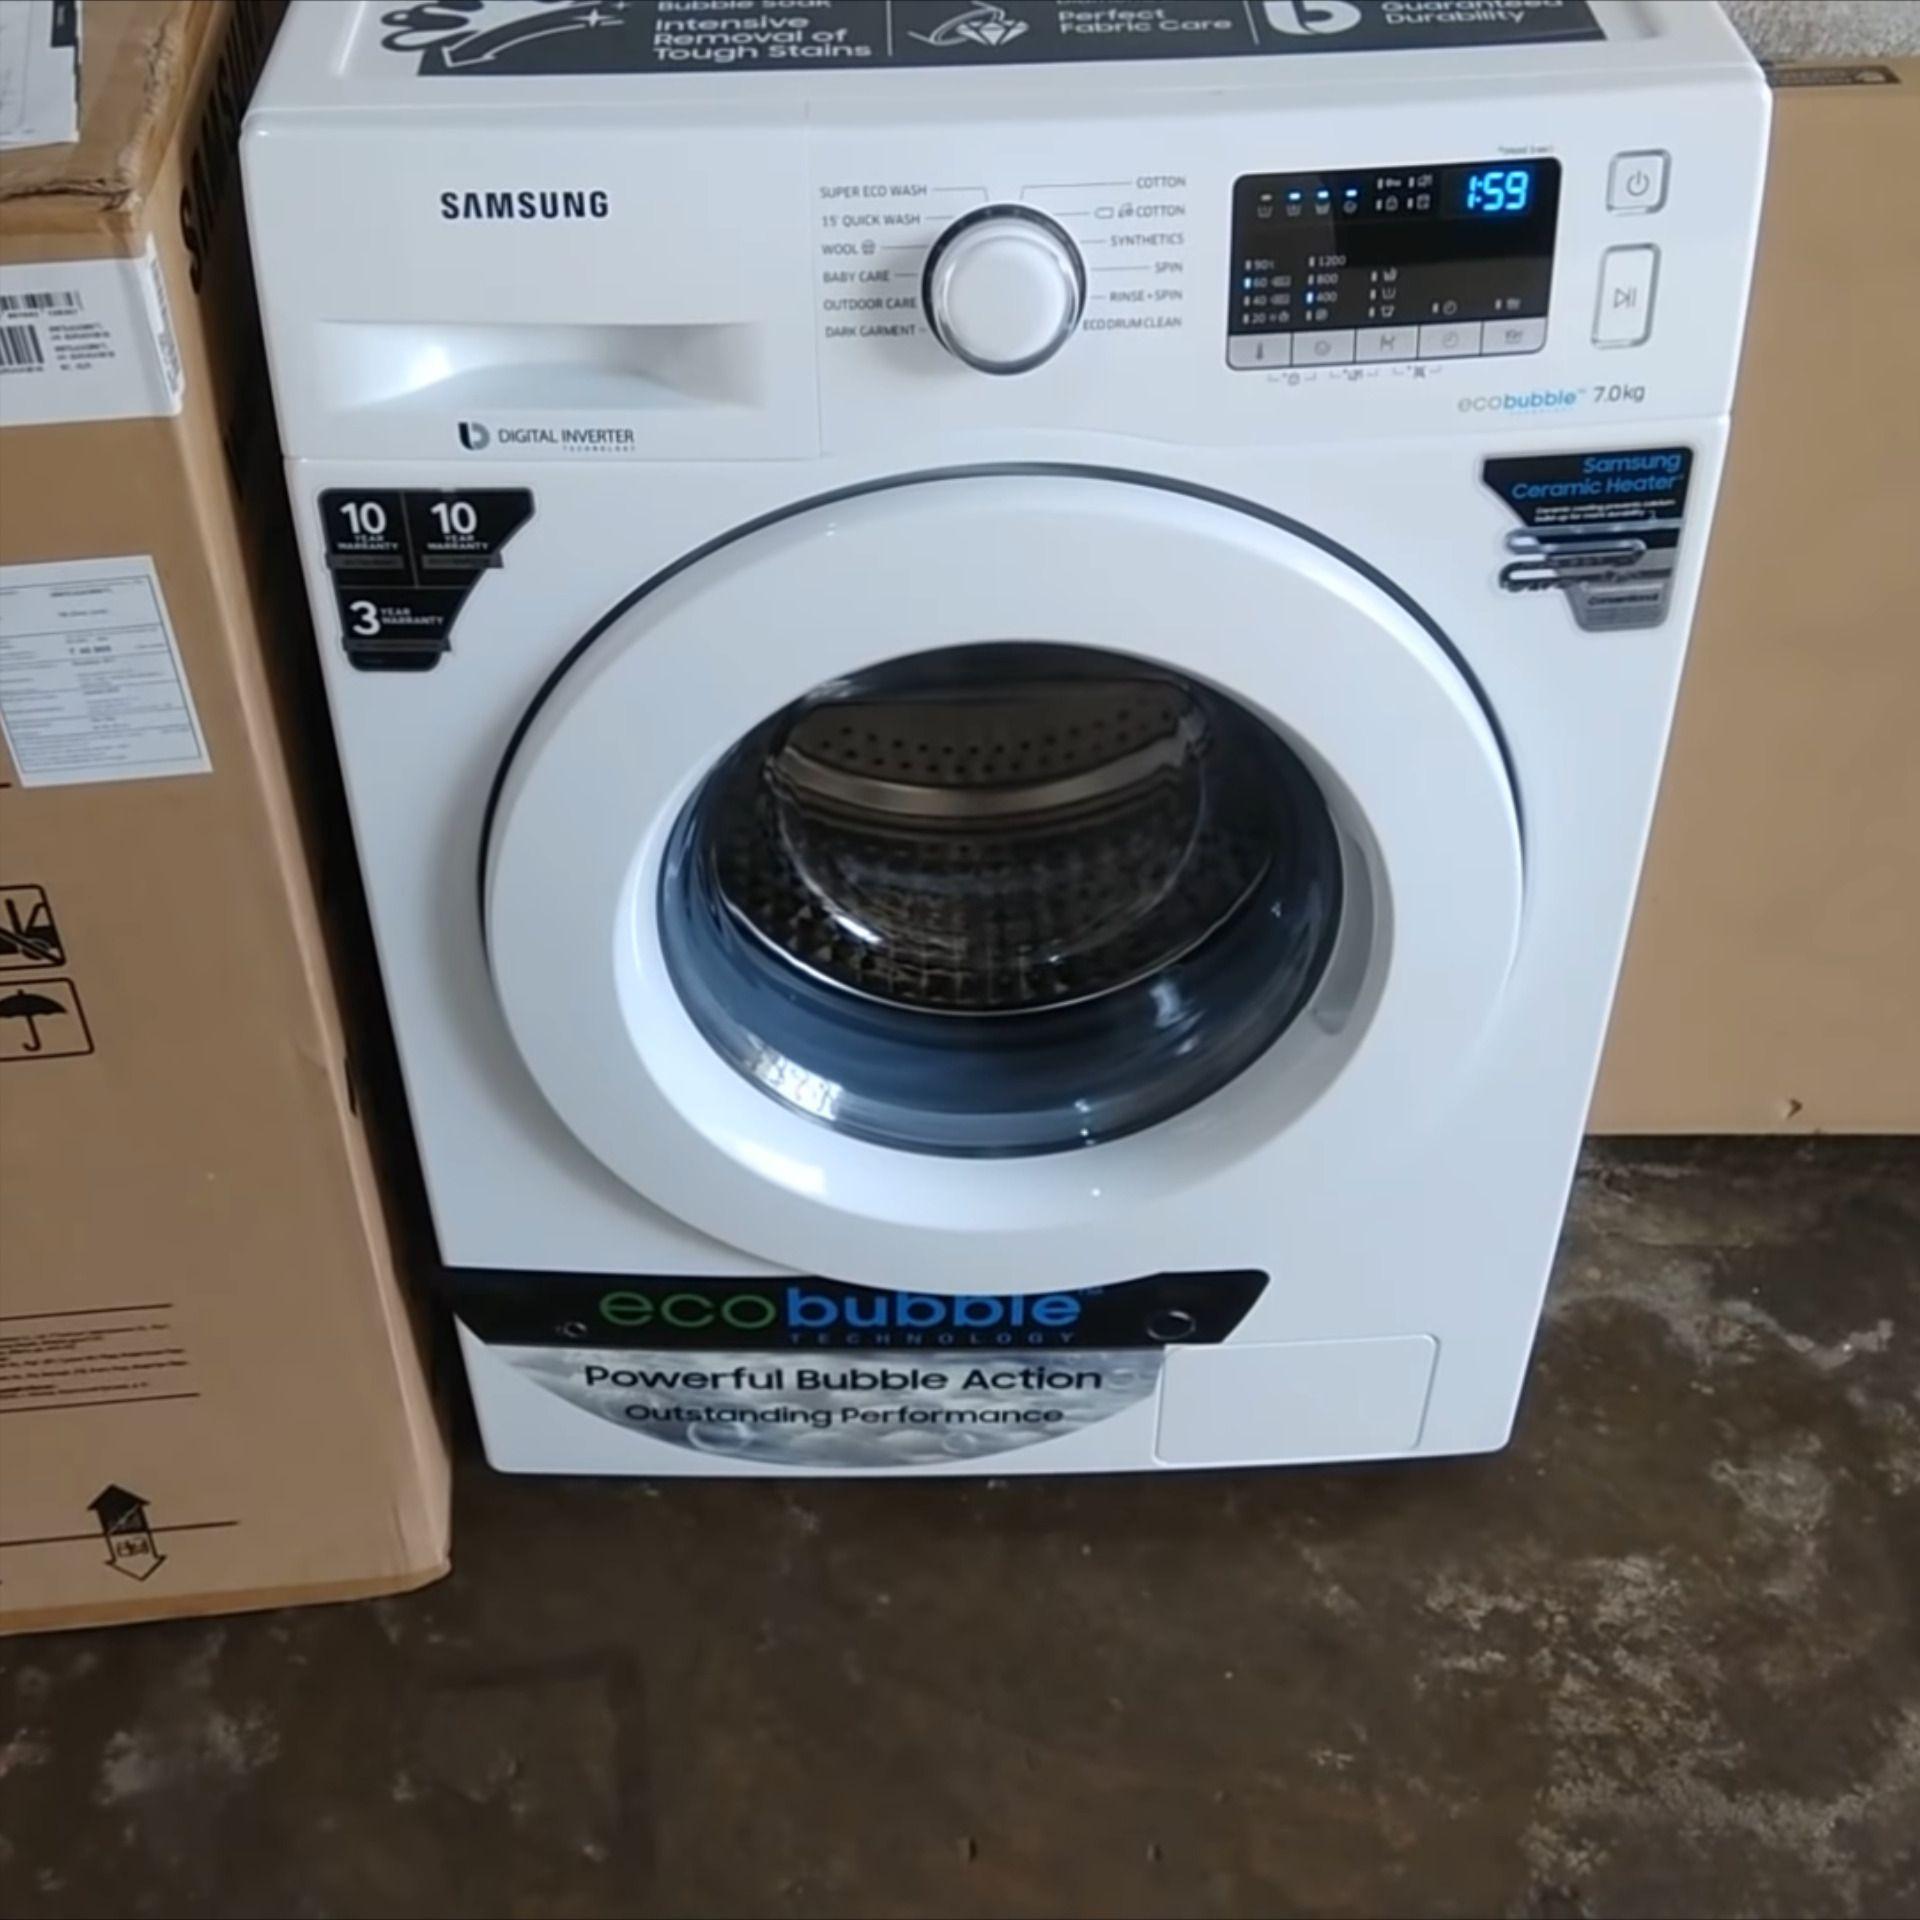 Lowes Washing Machine Hose Washing Machine Amazon Estate Washing Machine Manual Coin Operated In 2020 Washing Machine Automatic Washing Machine Washing